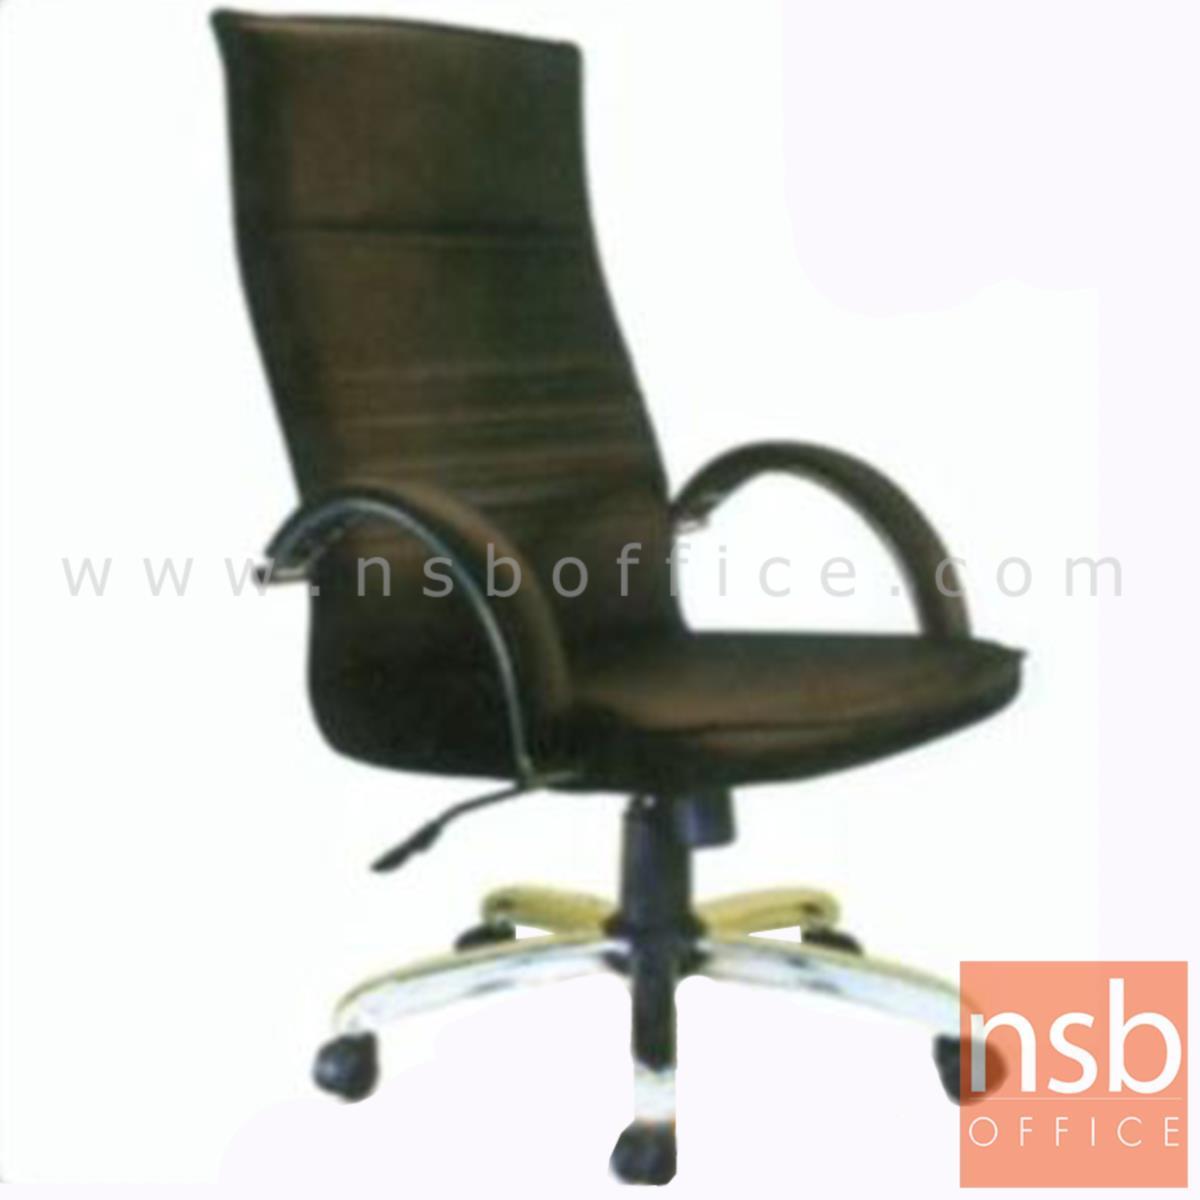 B01A295:เก้าอี้ผู้บริหาร รุ่น Rexall  โช๊คแก๊ส มีก้อนโยก ขาเหล็กชุบโครเมี่ยม